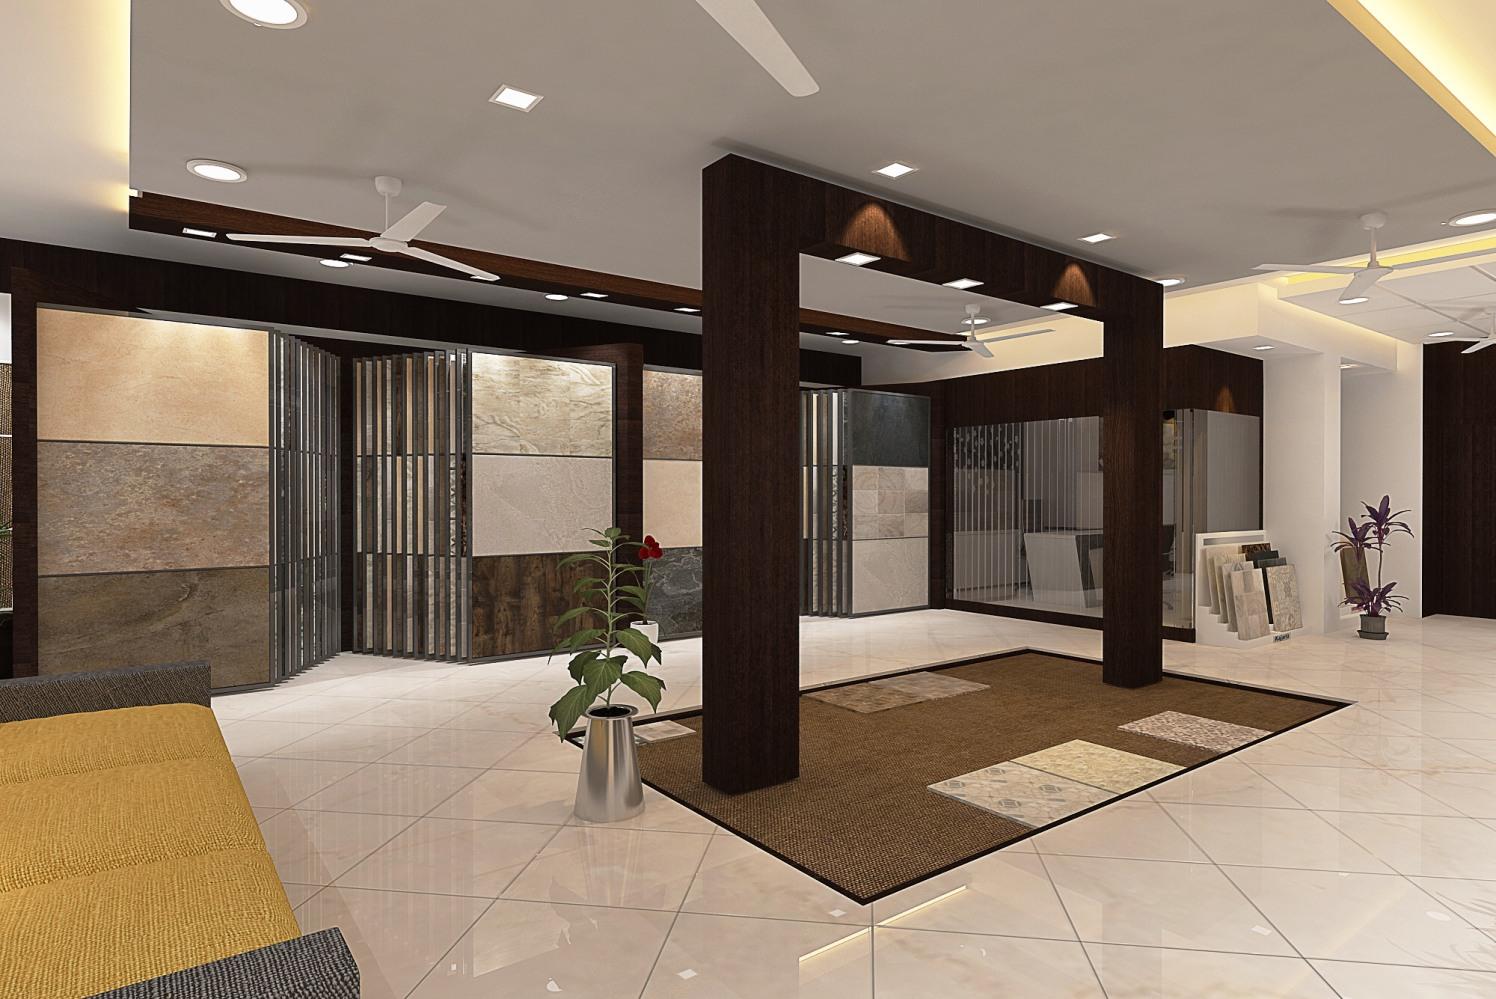 Showroom With Marble Tiles by setu.patel | Interior Design Photos & Ideas